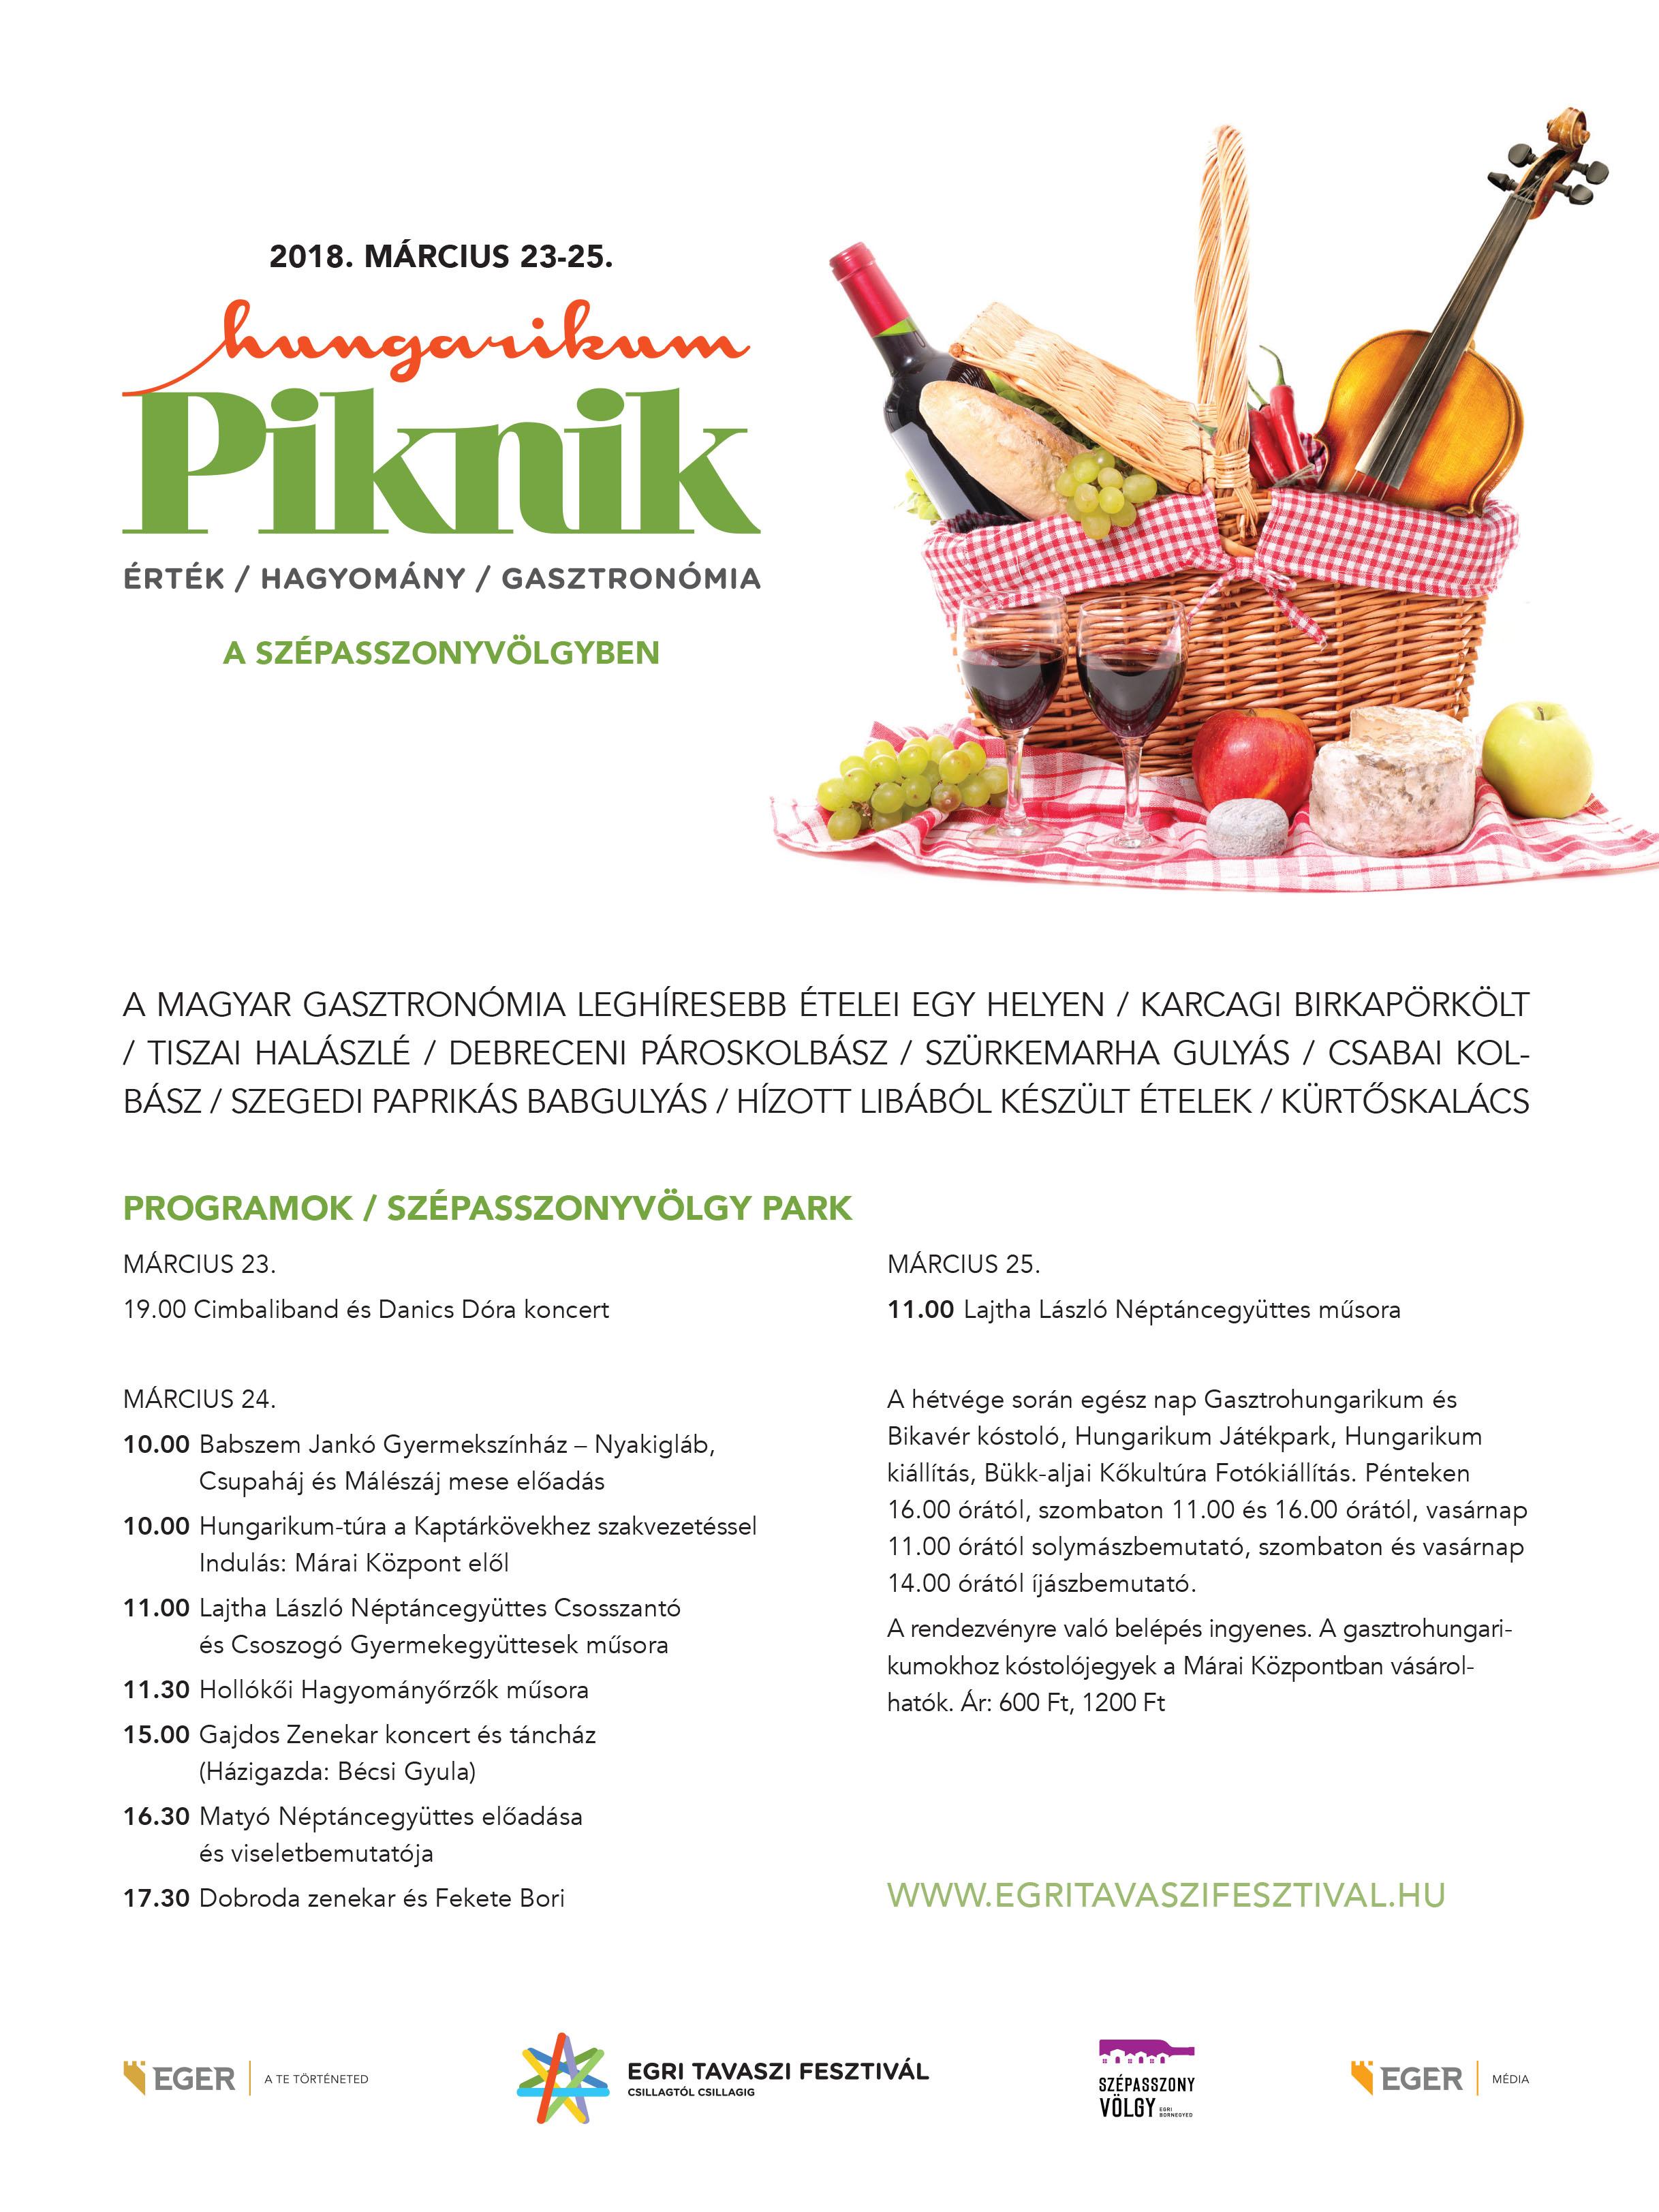 hungarikum_piknik_plakat.jpg